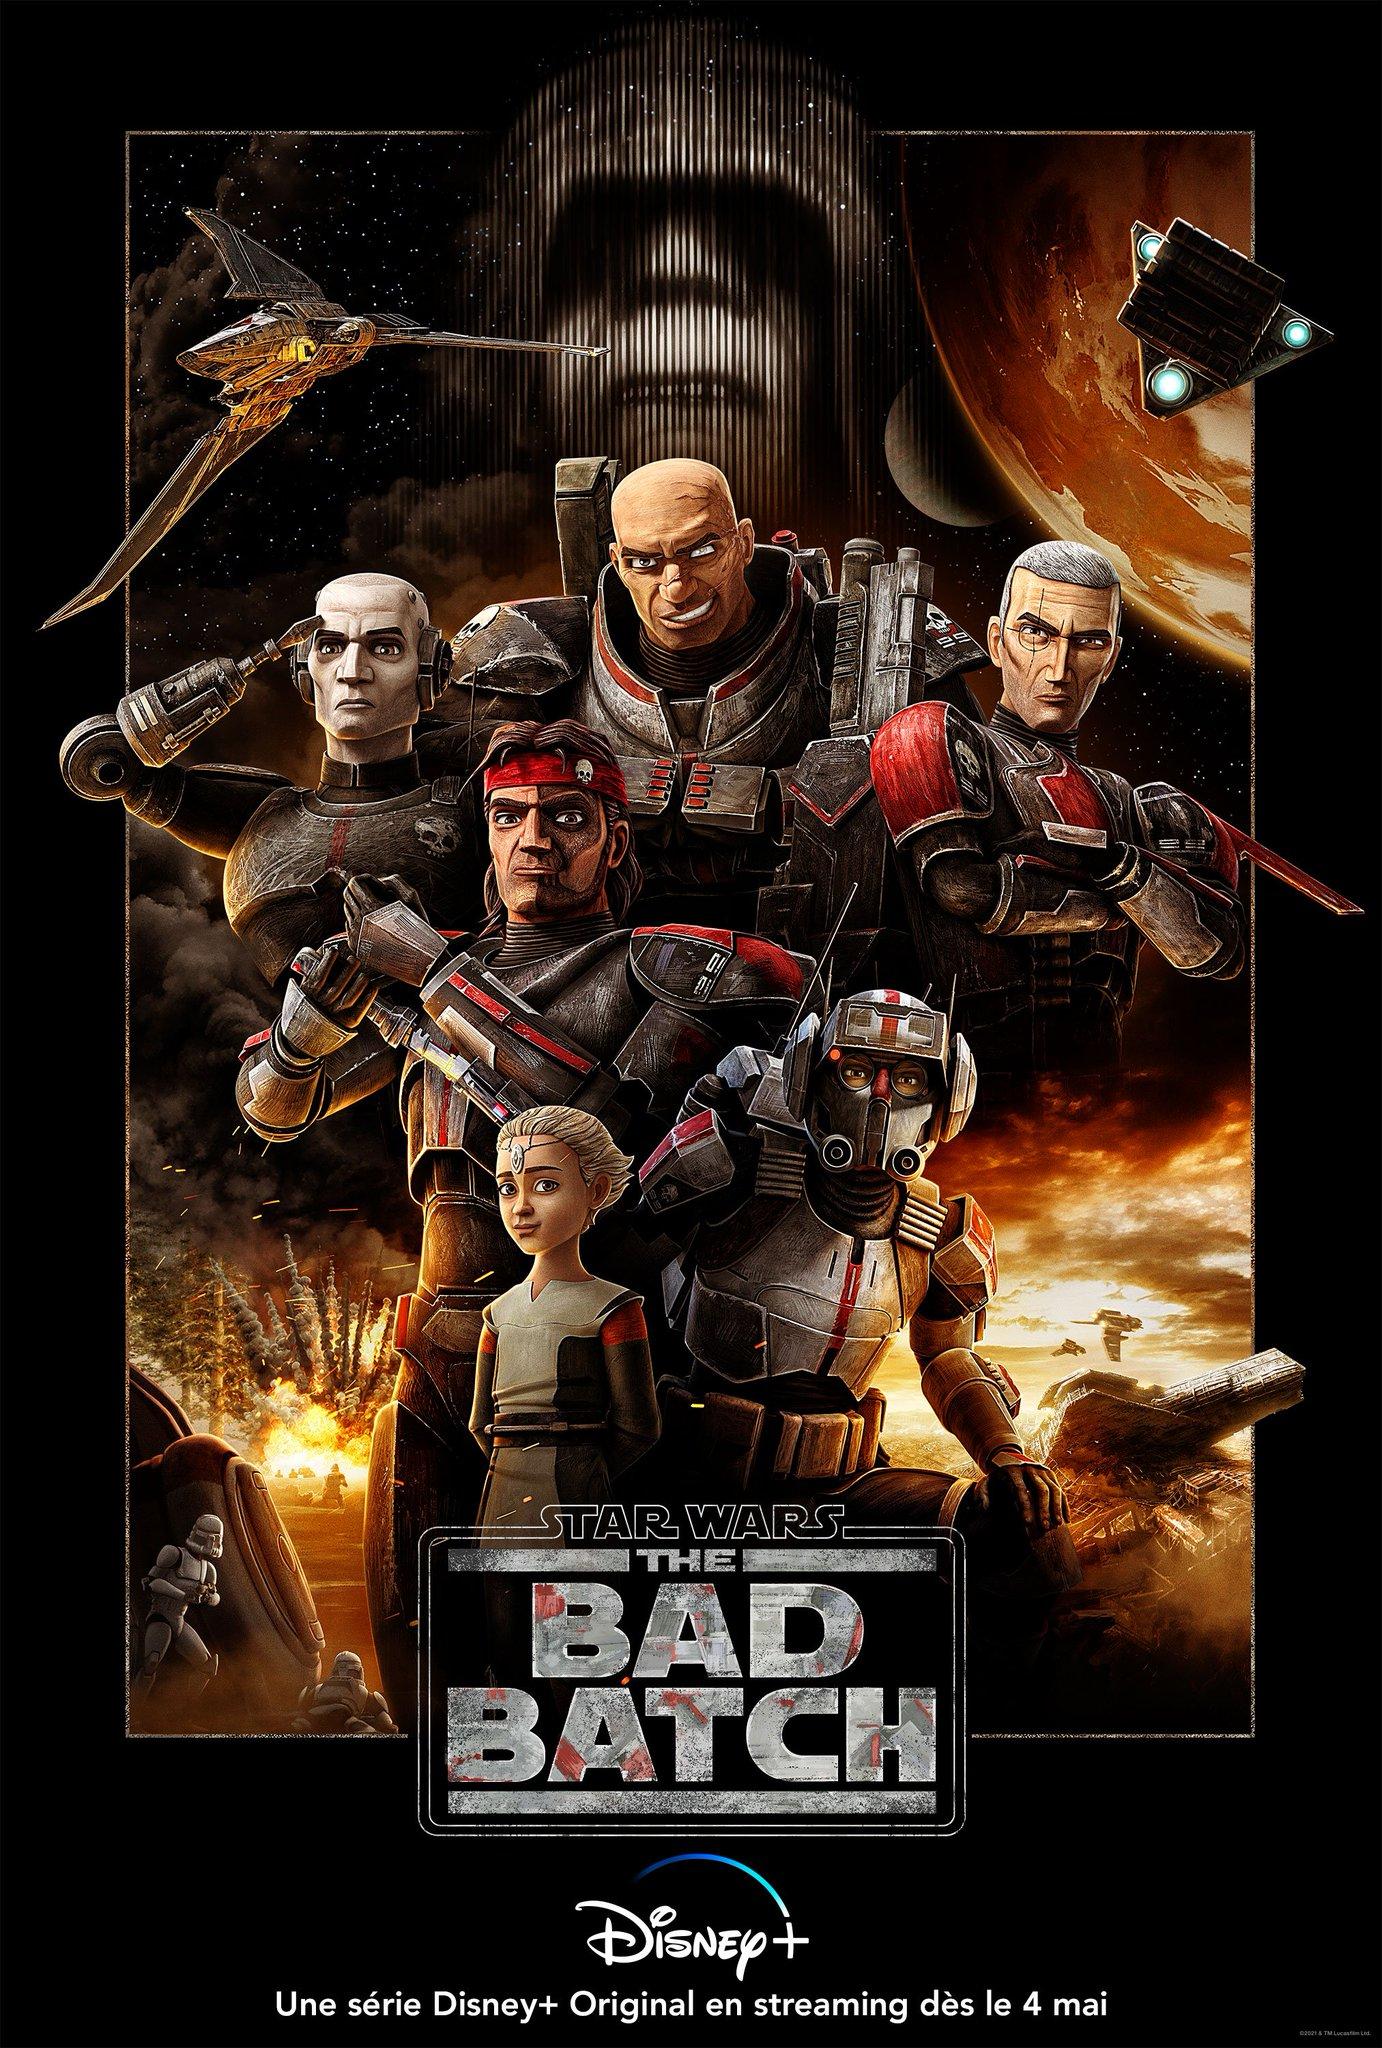 Star Wars : The Bad Batch [Lucasfilm - 2021] EzBTjYqWgAA48f6?format=jpg&name=large